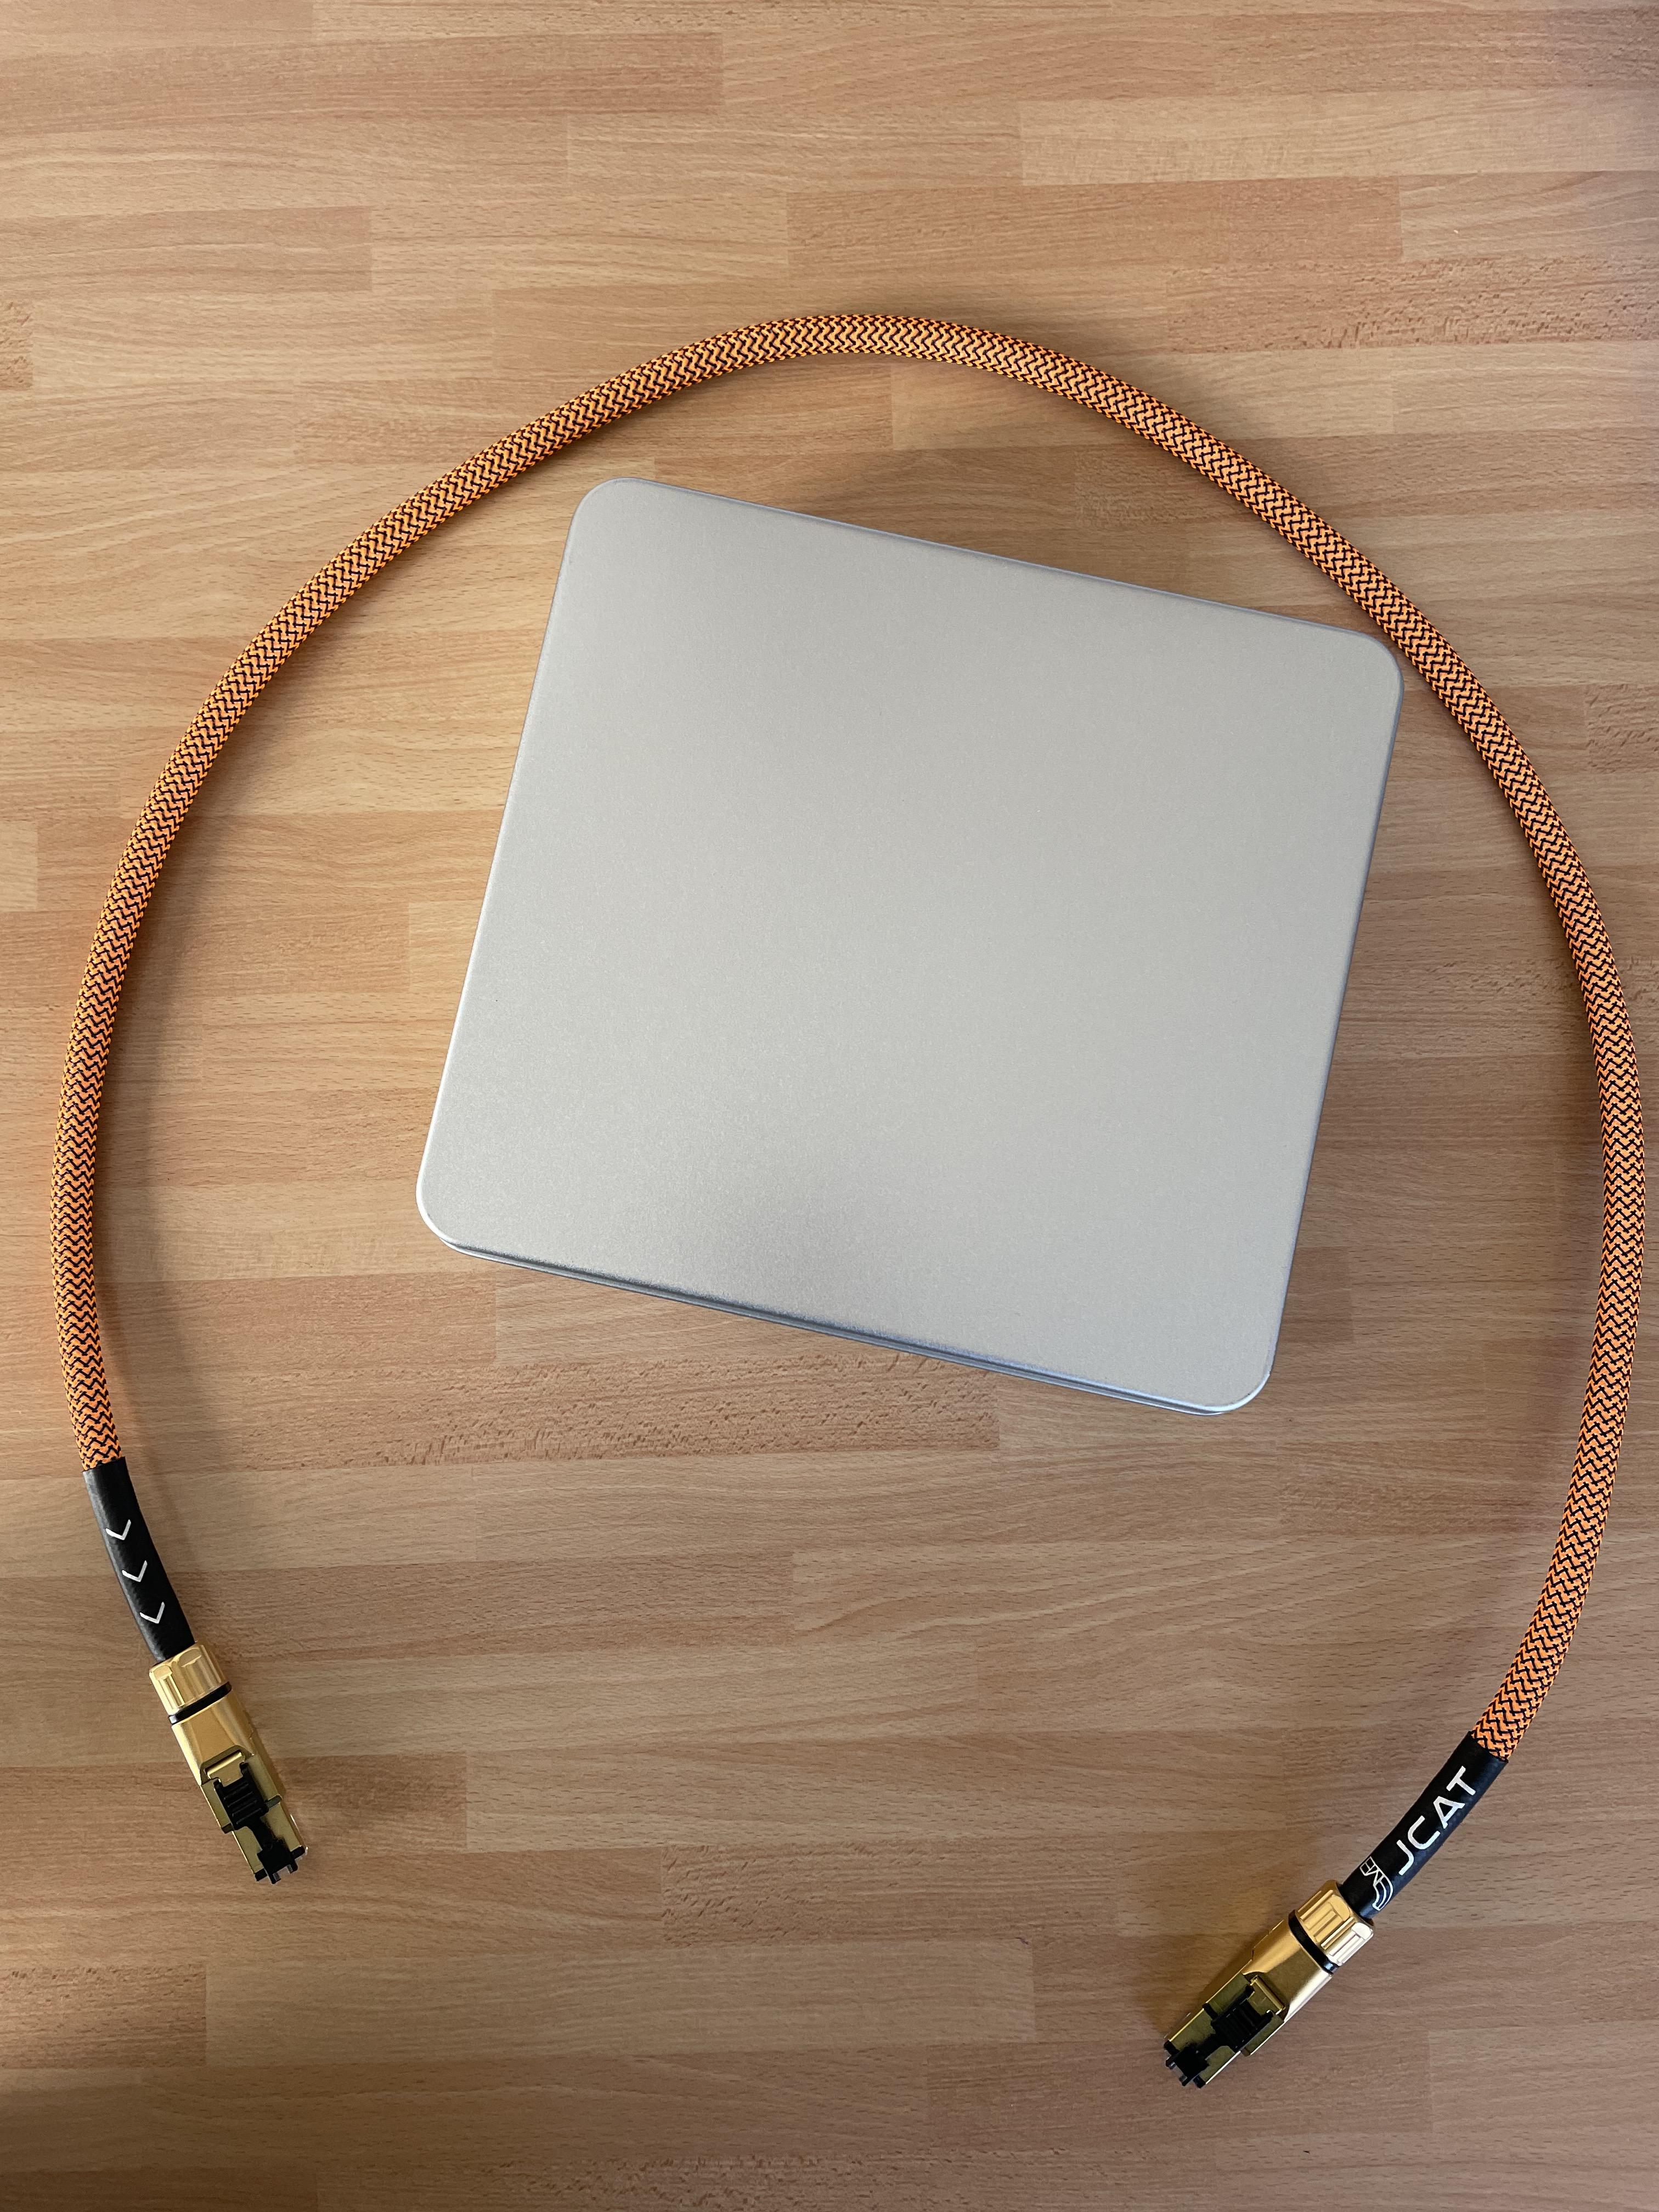 JCAT Signature LAN Cable GOLD